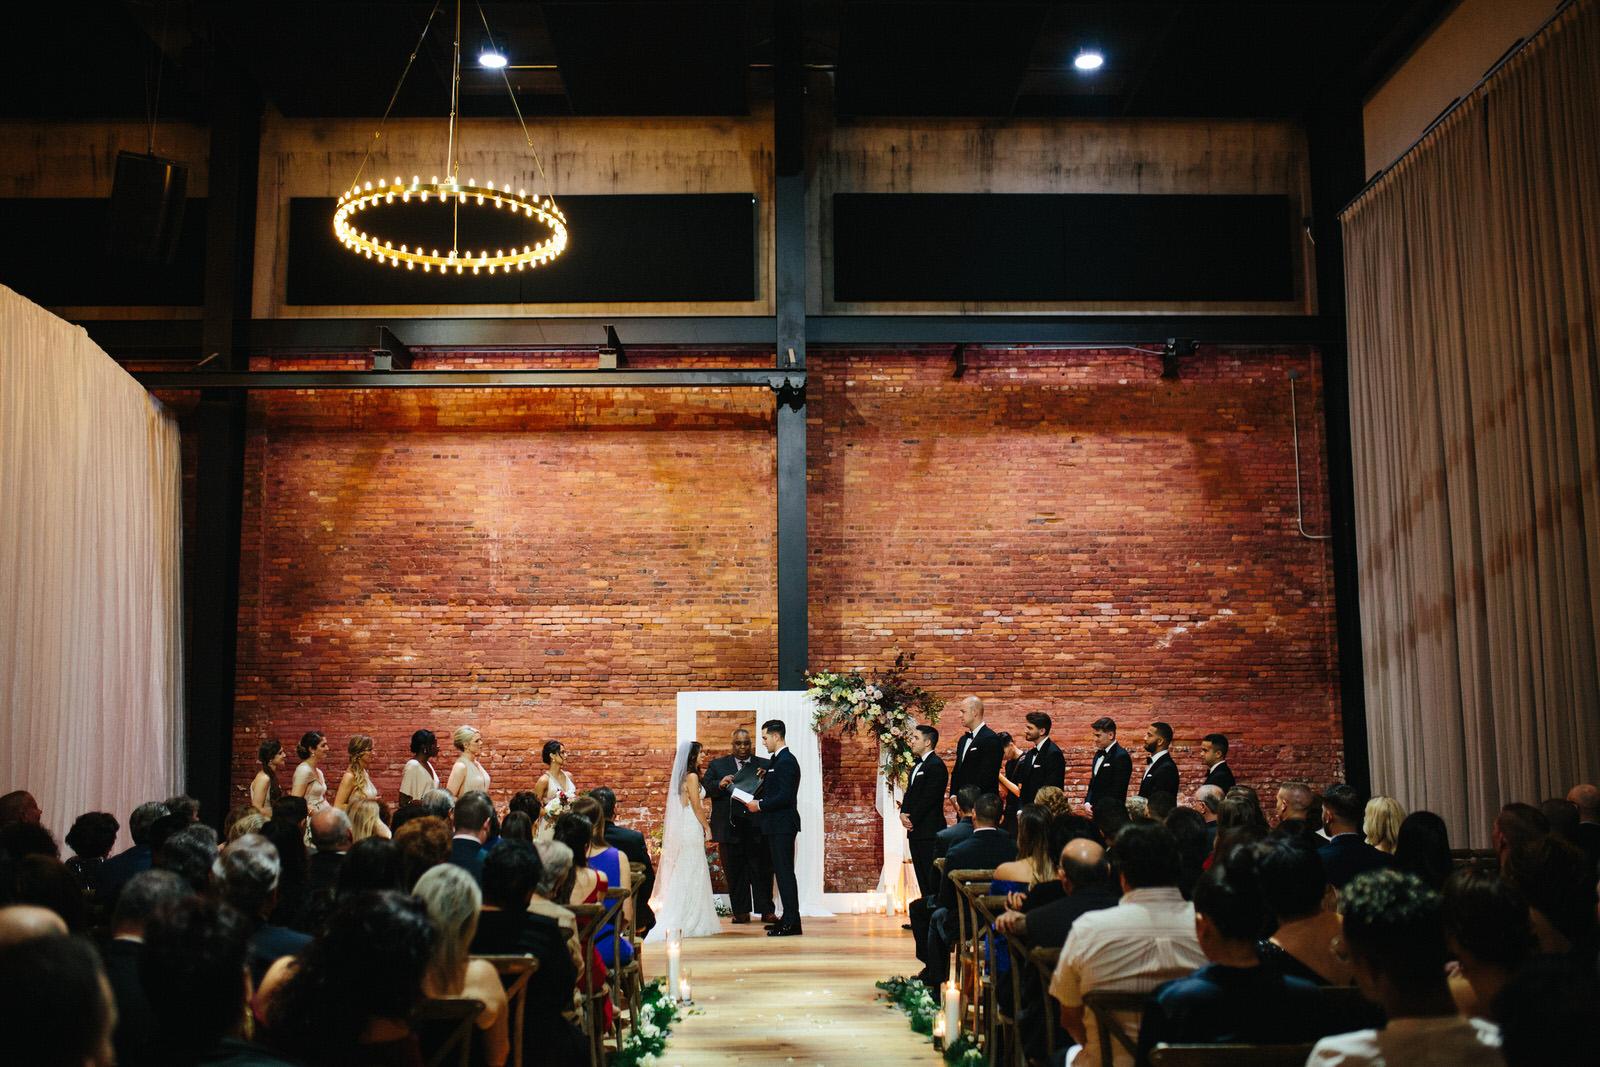 Bride and Groom at Altar Armature Works Wedding